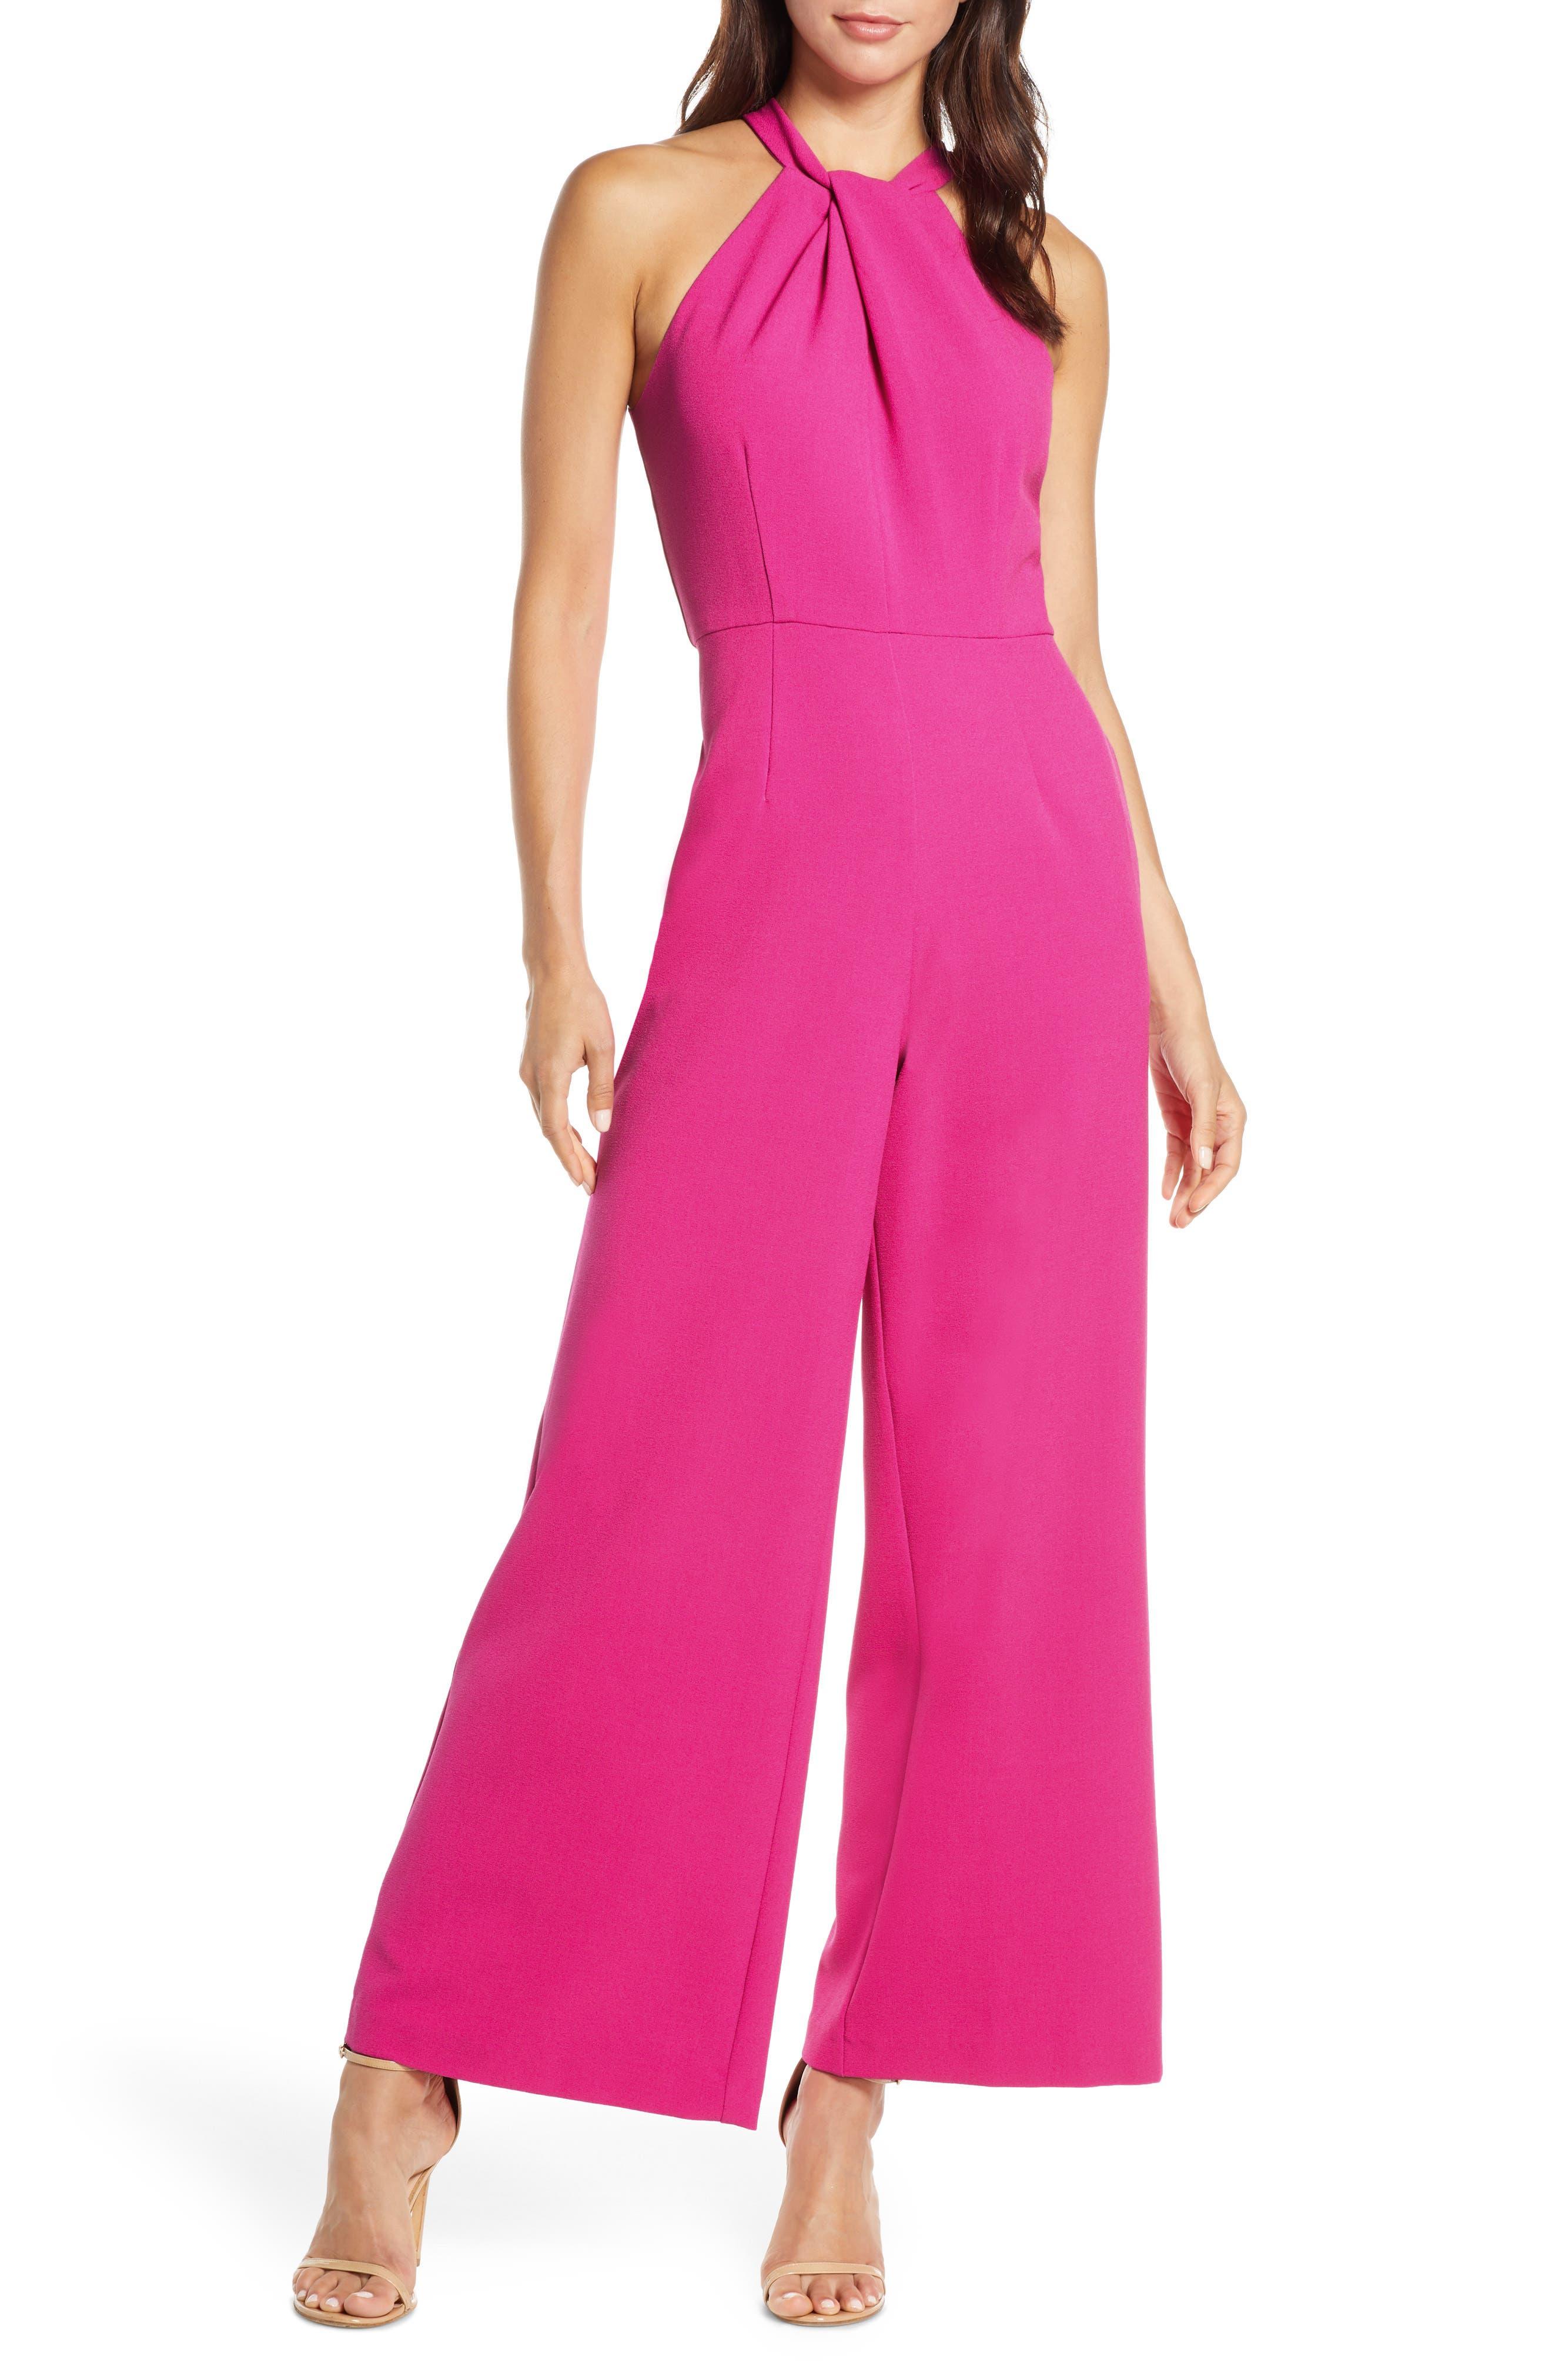 pink dresses for women,pink dresses for women,